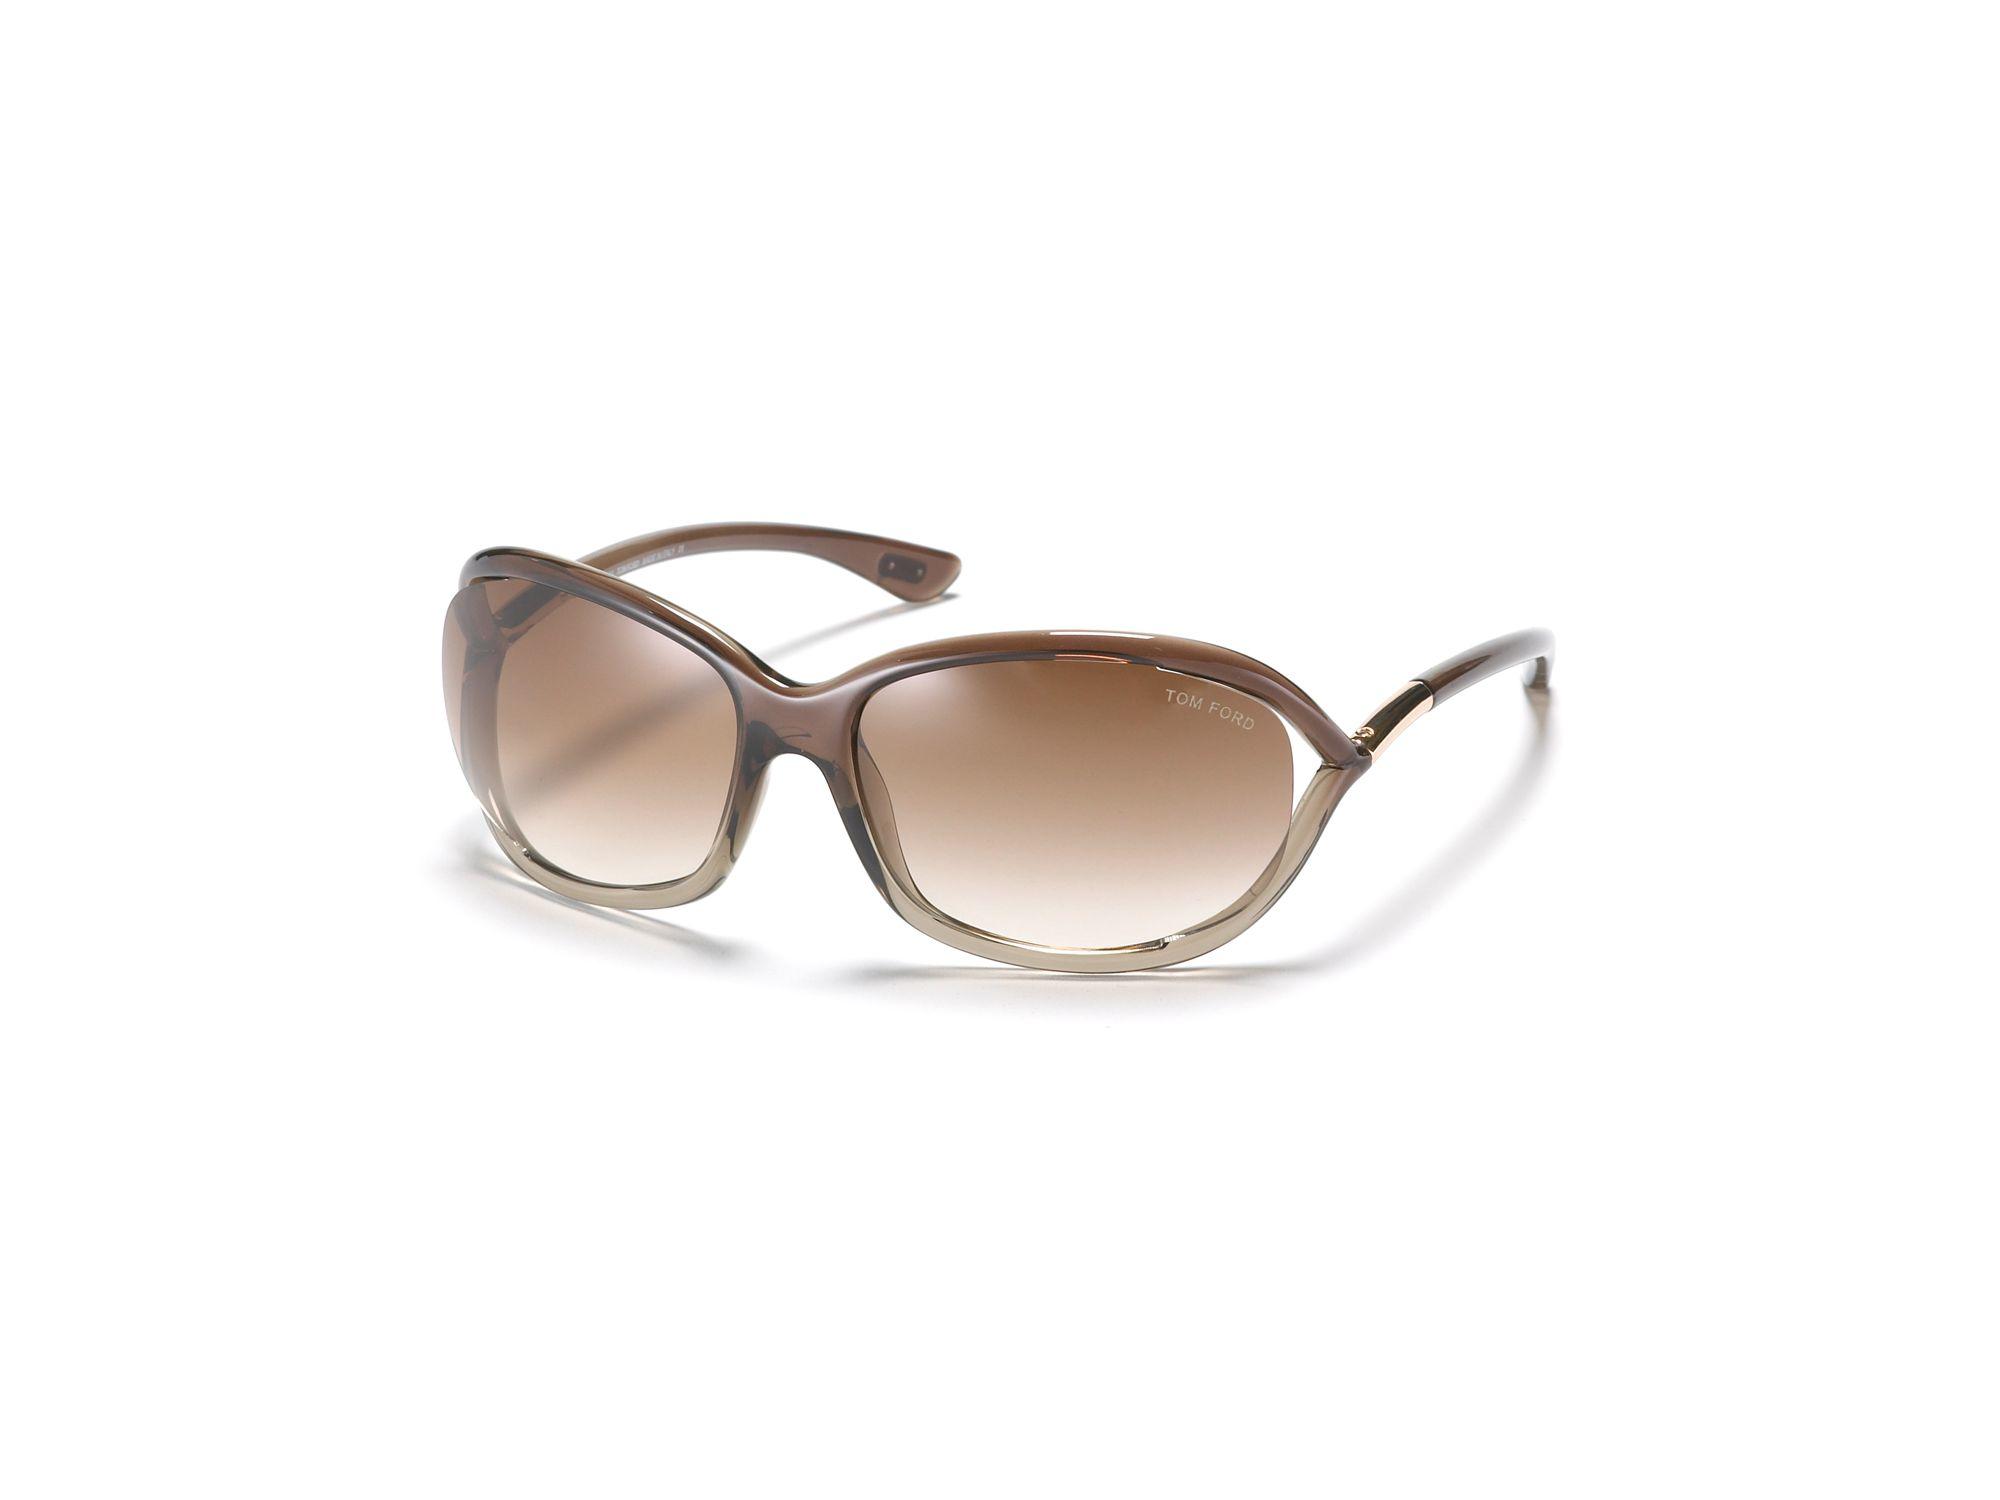 7a38bbe5a19 Tom Ford Sunglasses Sale Jennifer